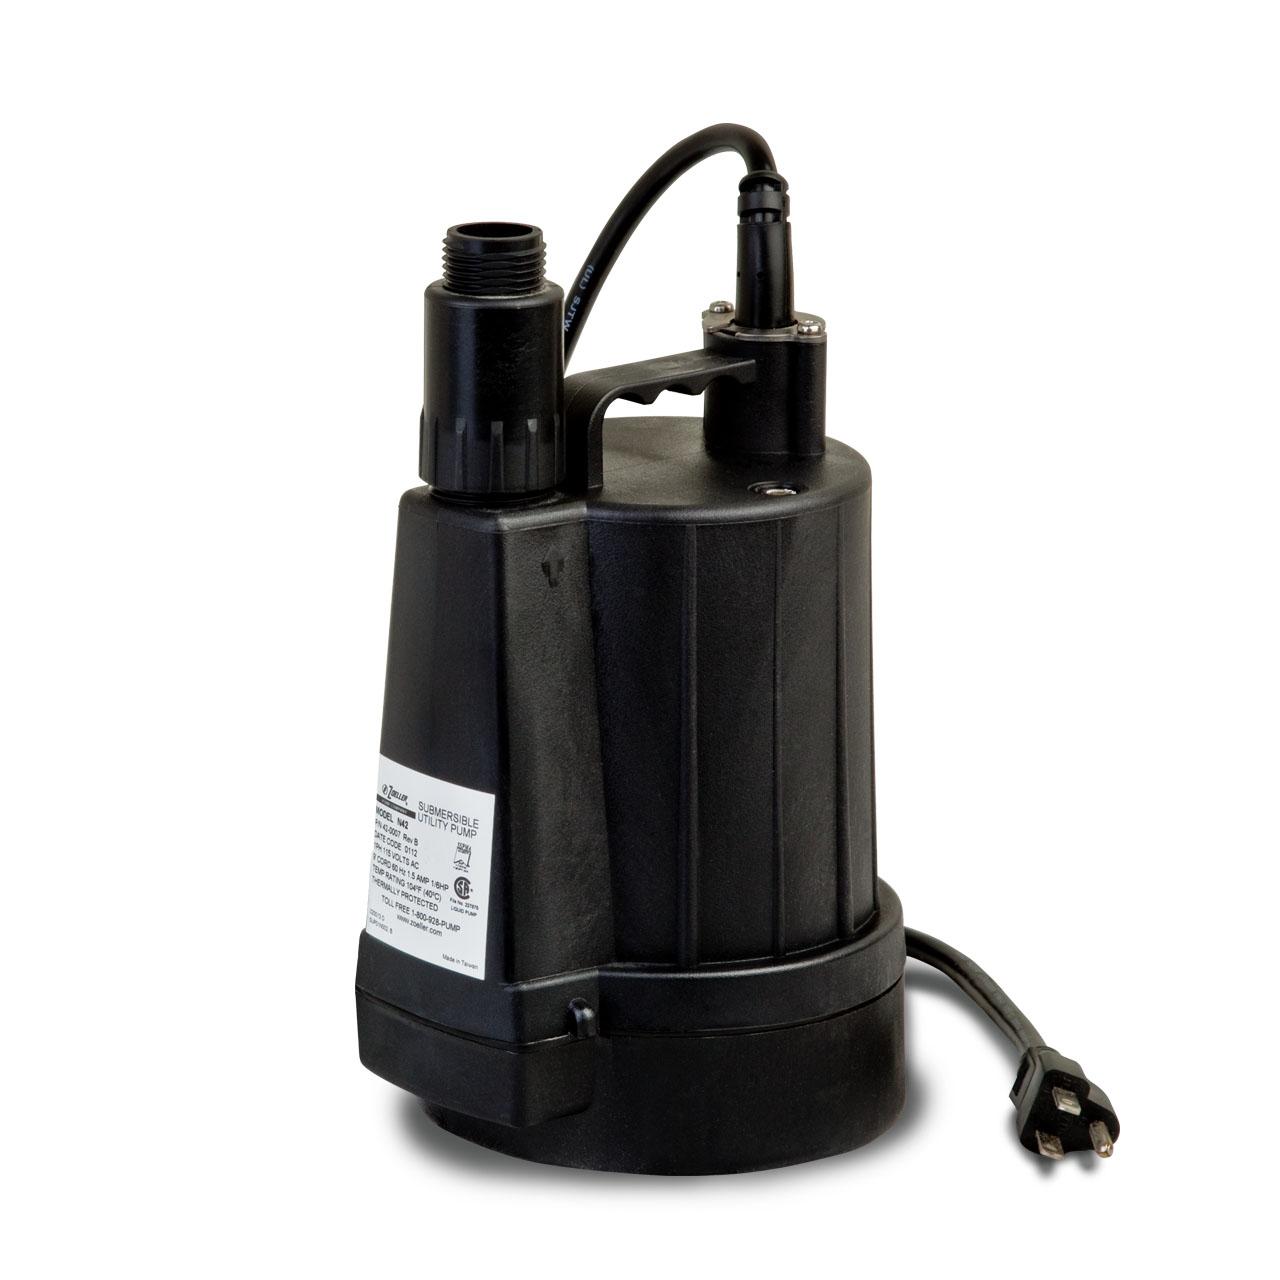 Zoeller zoeller 46 0005 model n46 thermoplastic utility for Drummond sewage pump